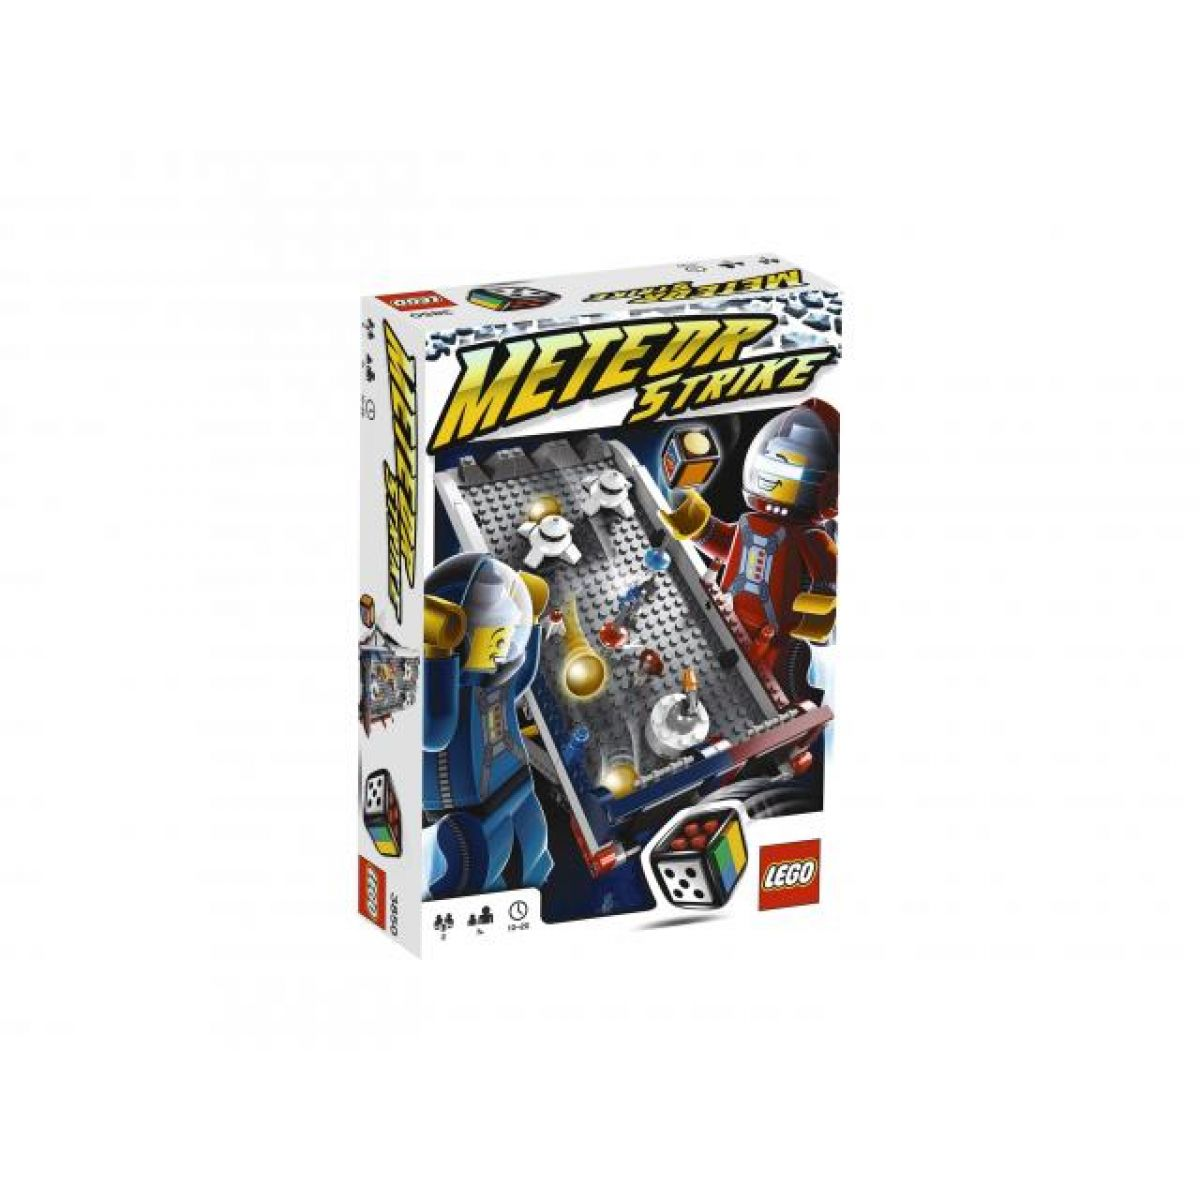 LEGO 3850 Hra Meteor Strike